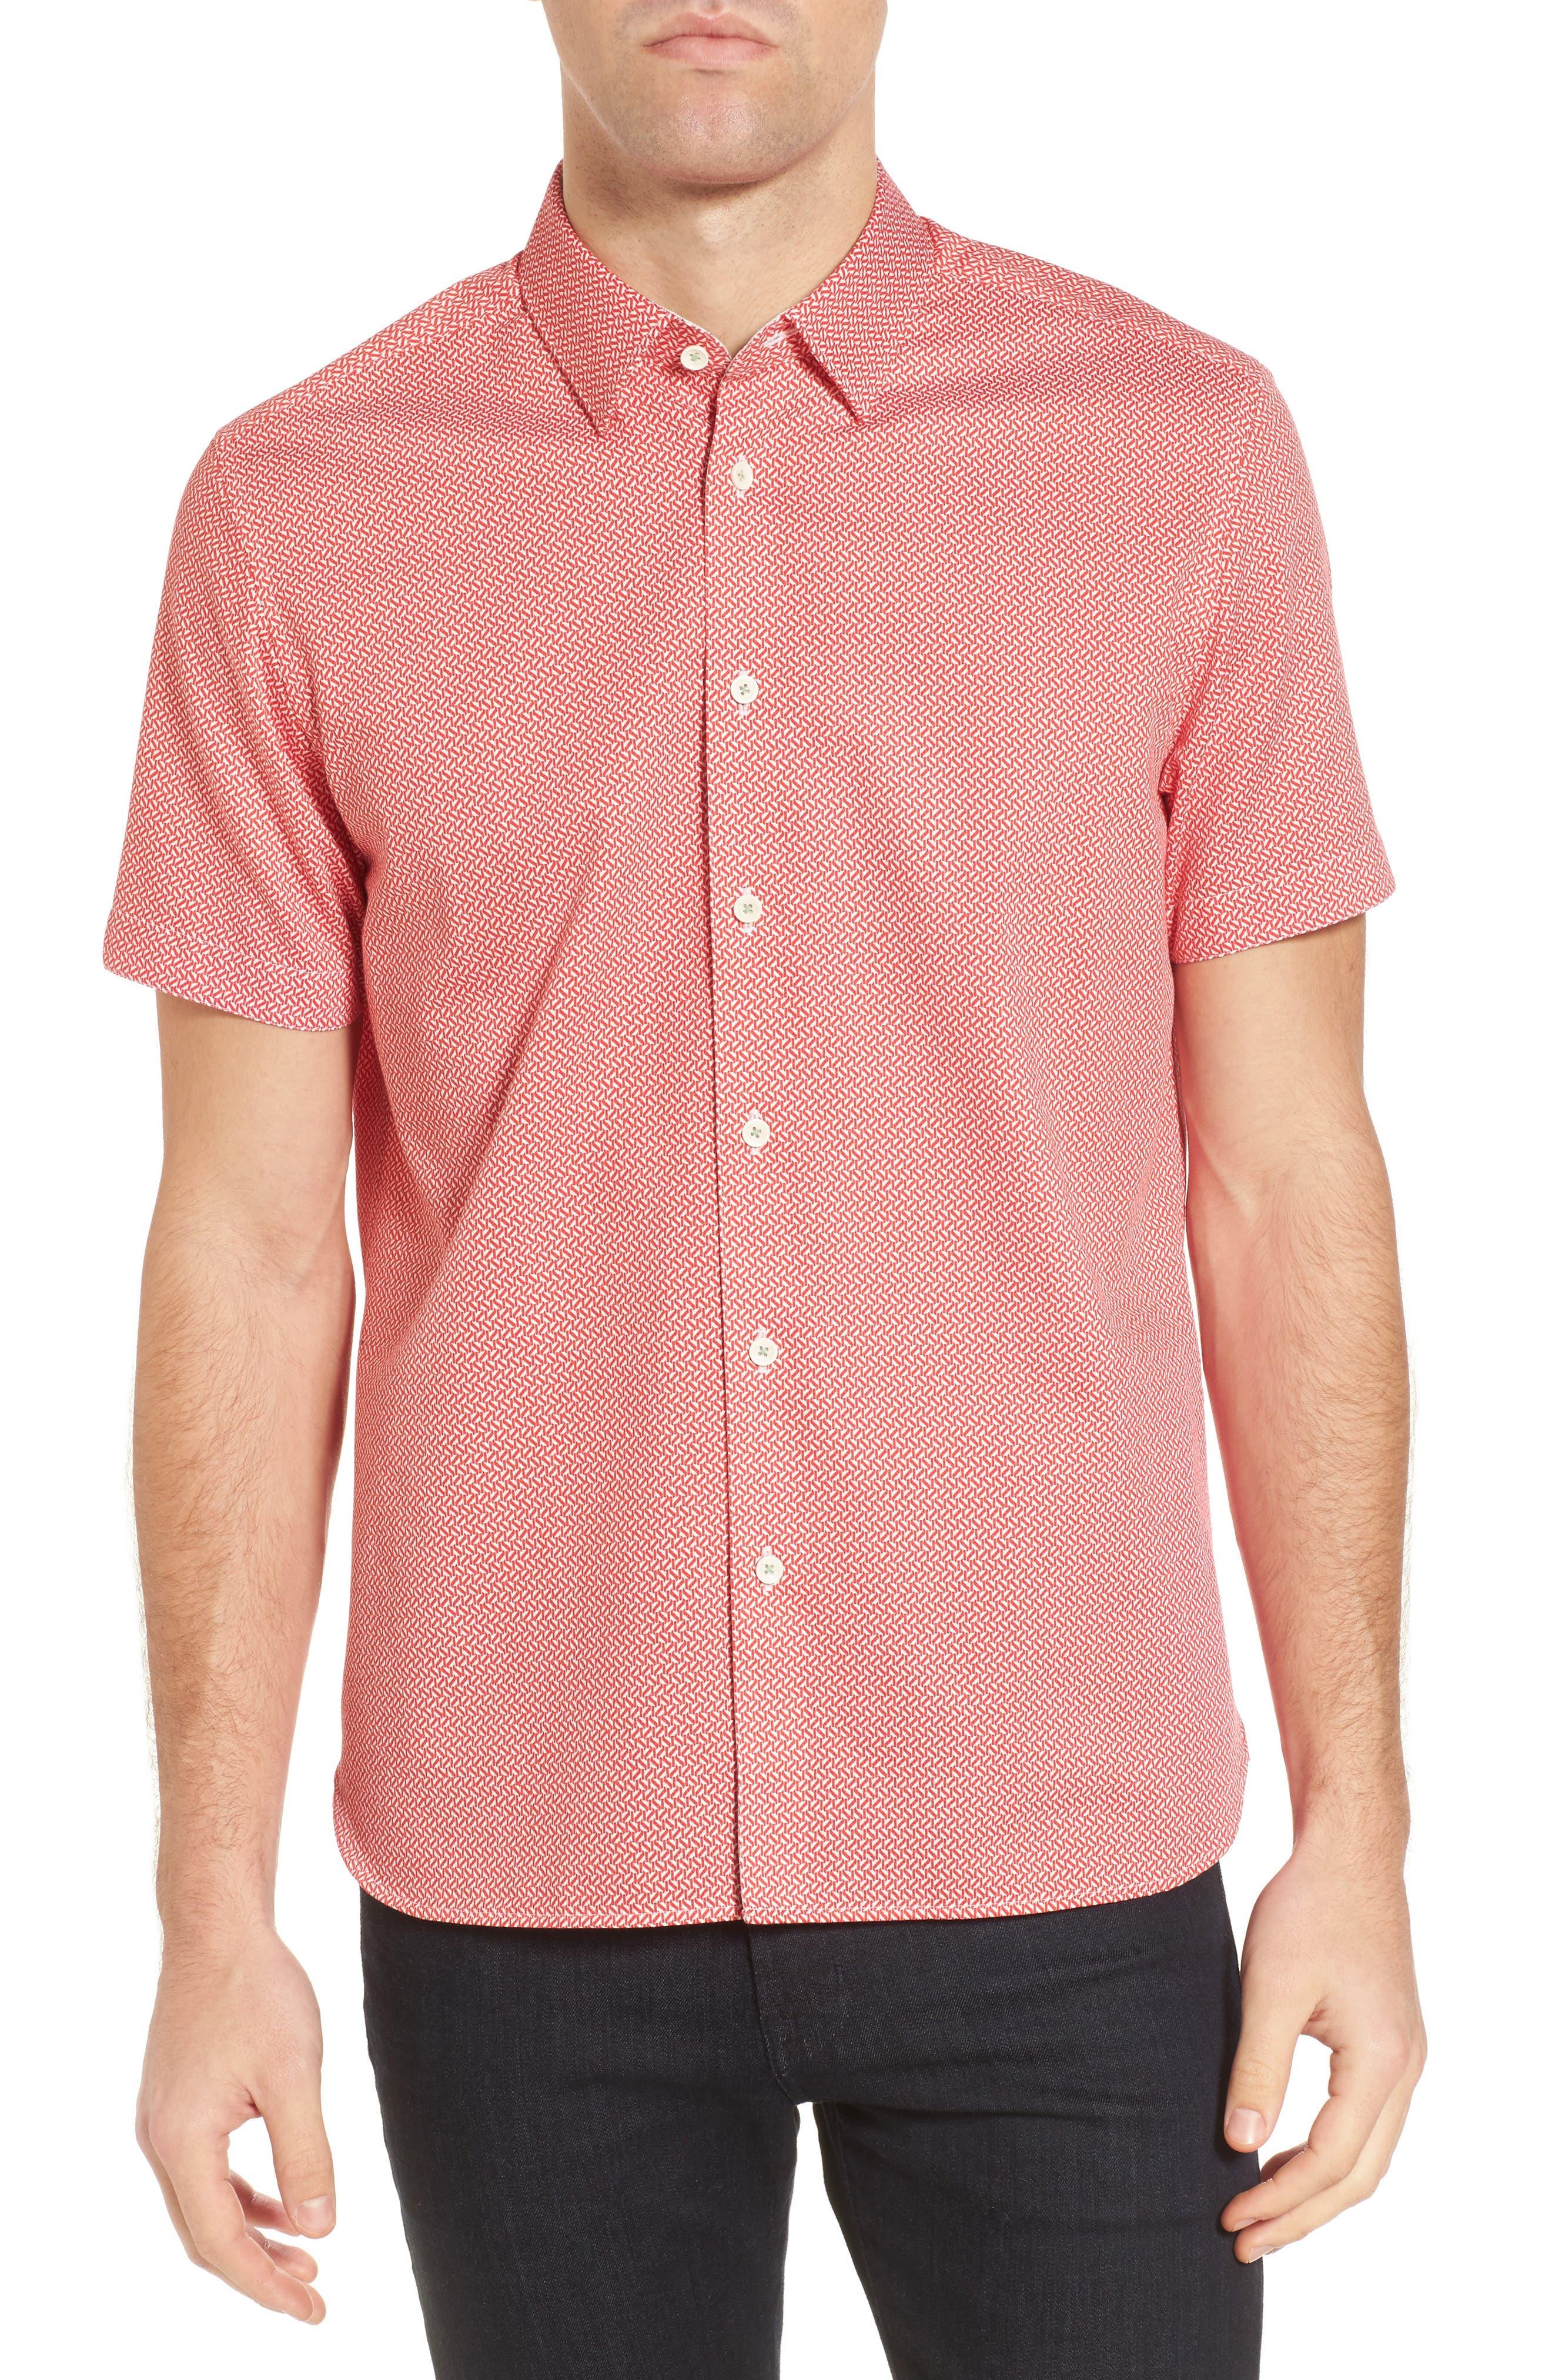 Alternate Image 1 Selected - Ted Baker London Slim Fit Print Sport Shirt